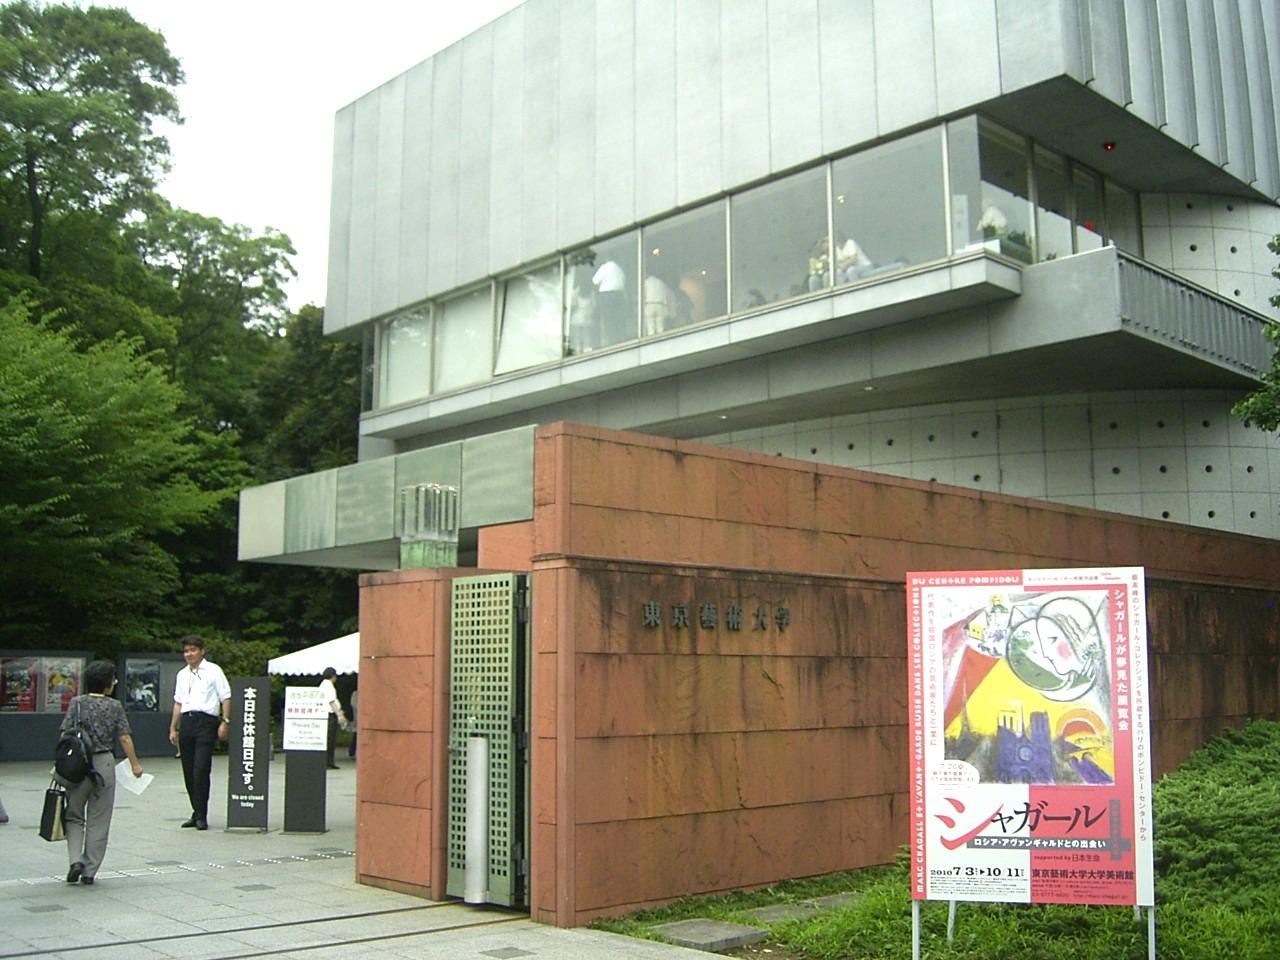 Chagall_025